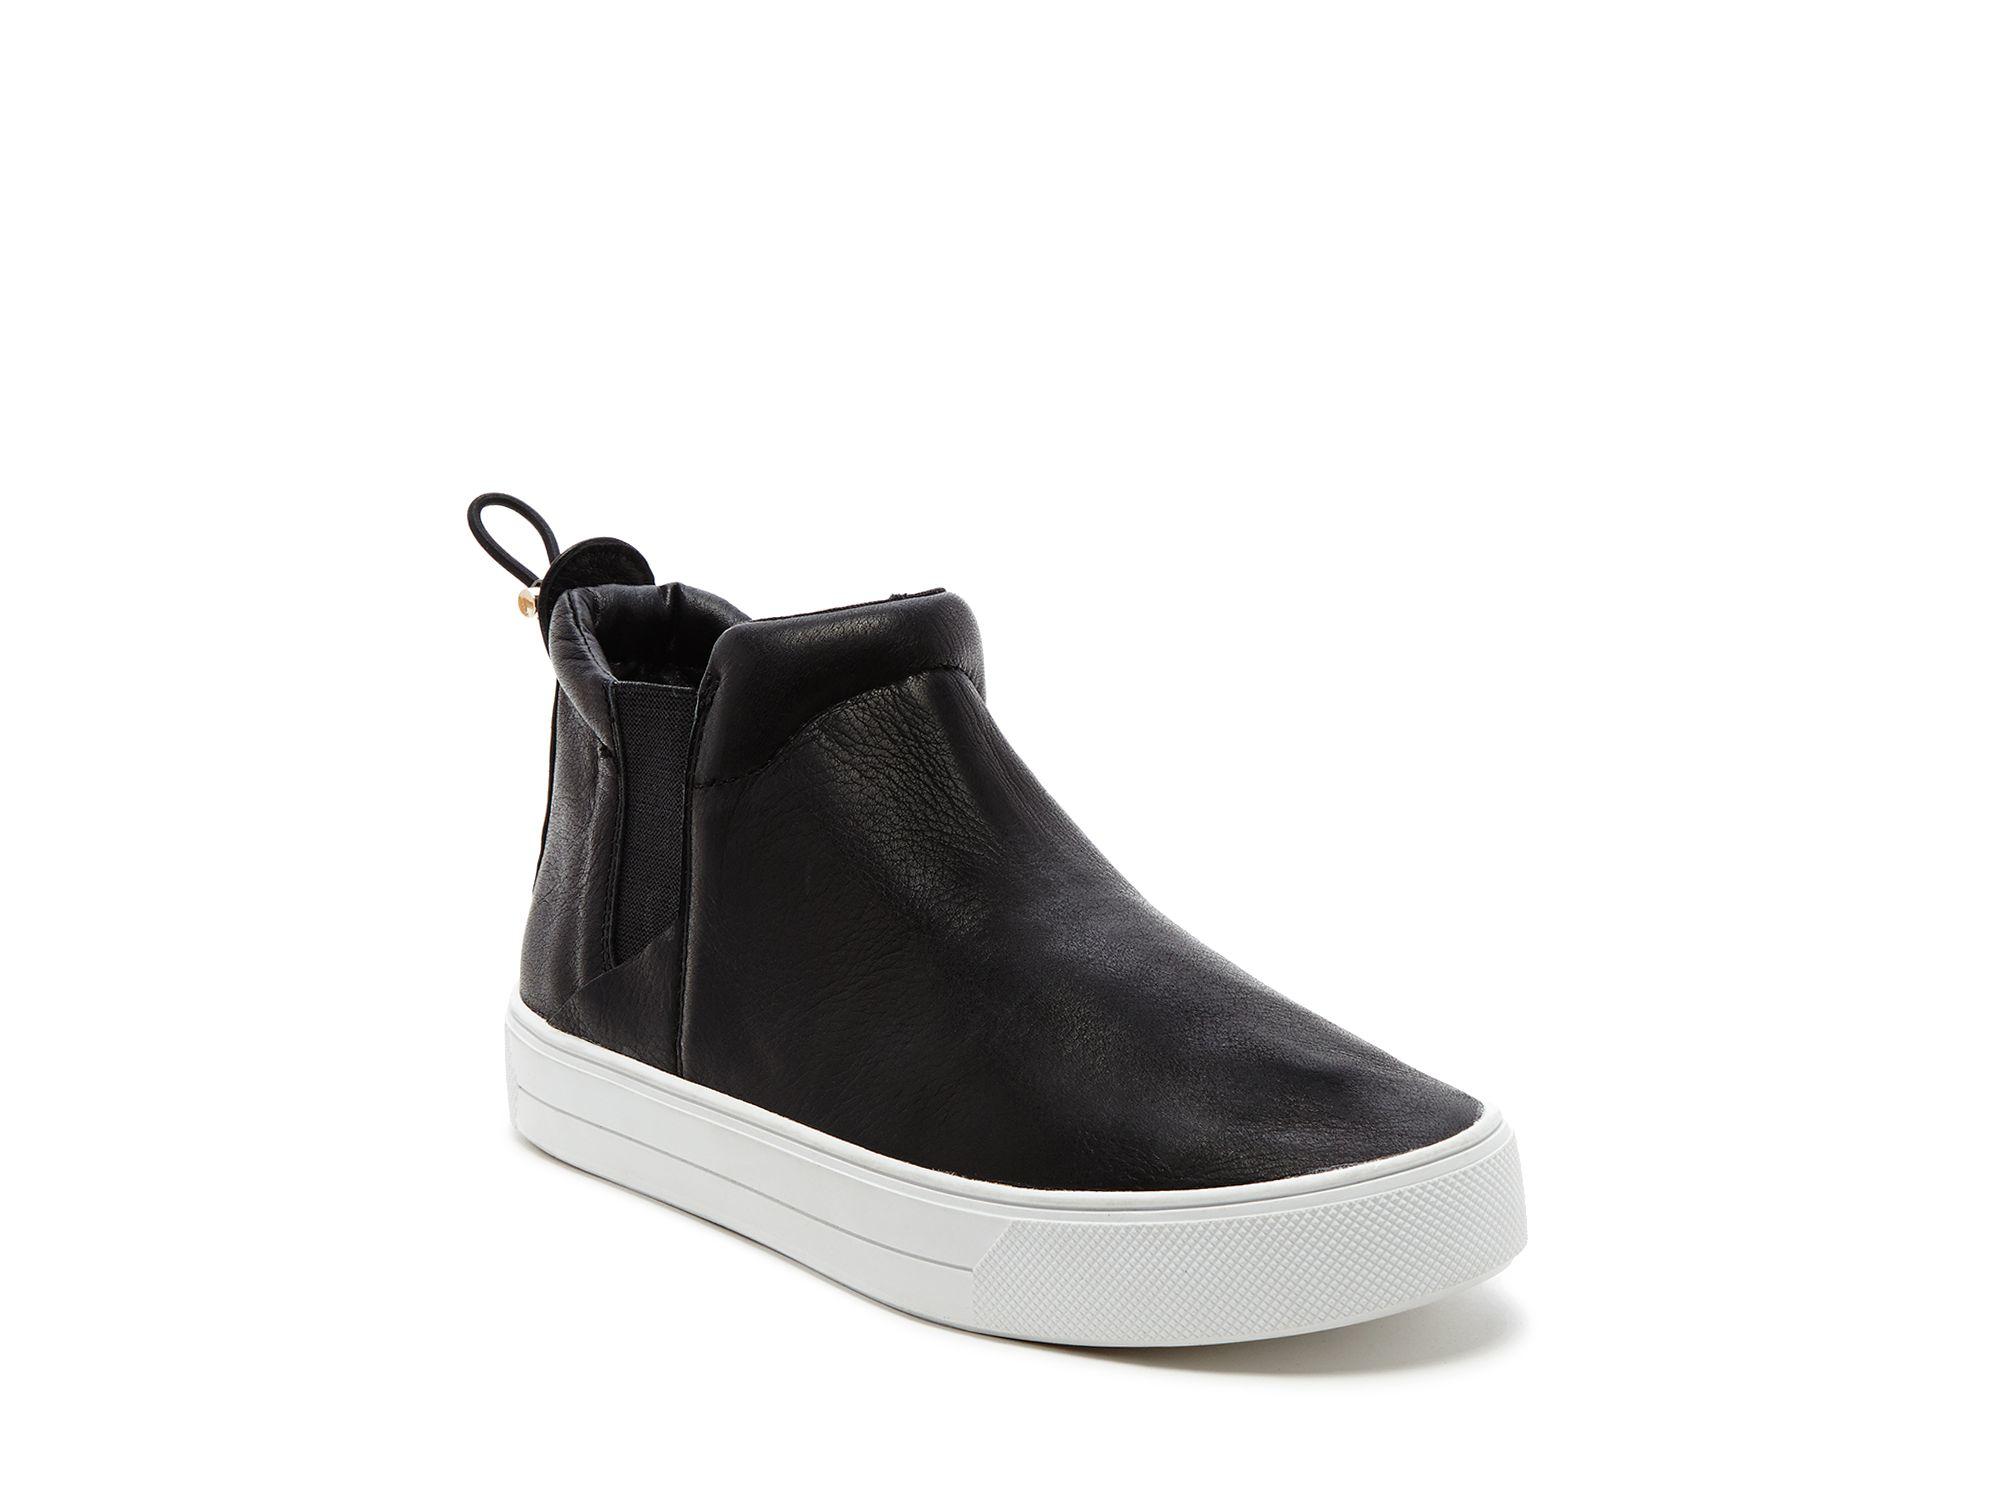 Dolce Vita Slip On Sneakers - Zelm High